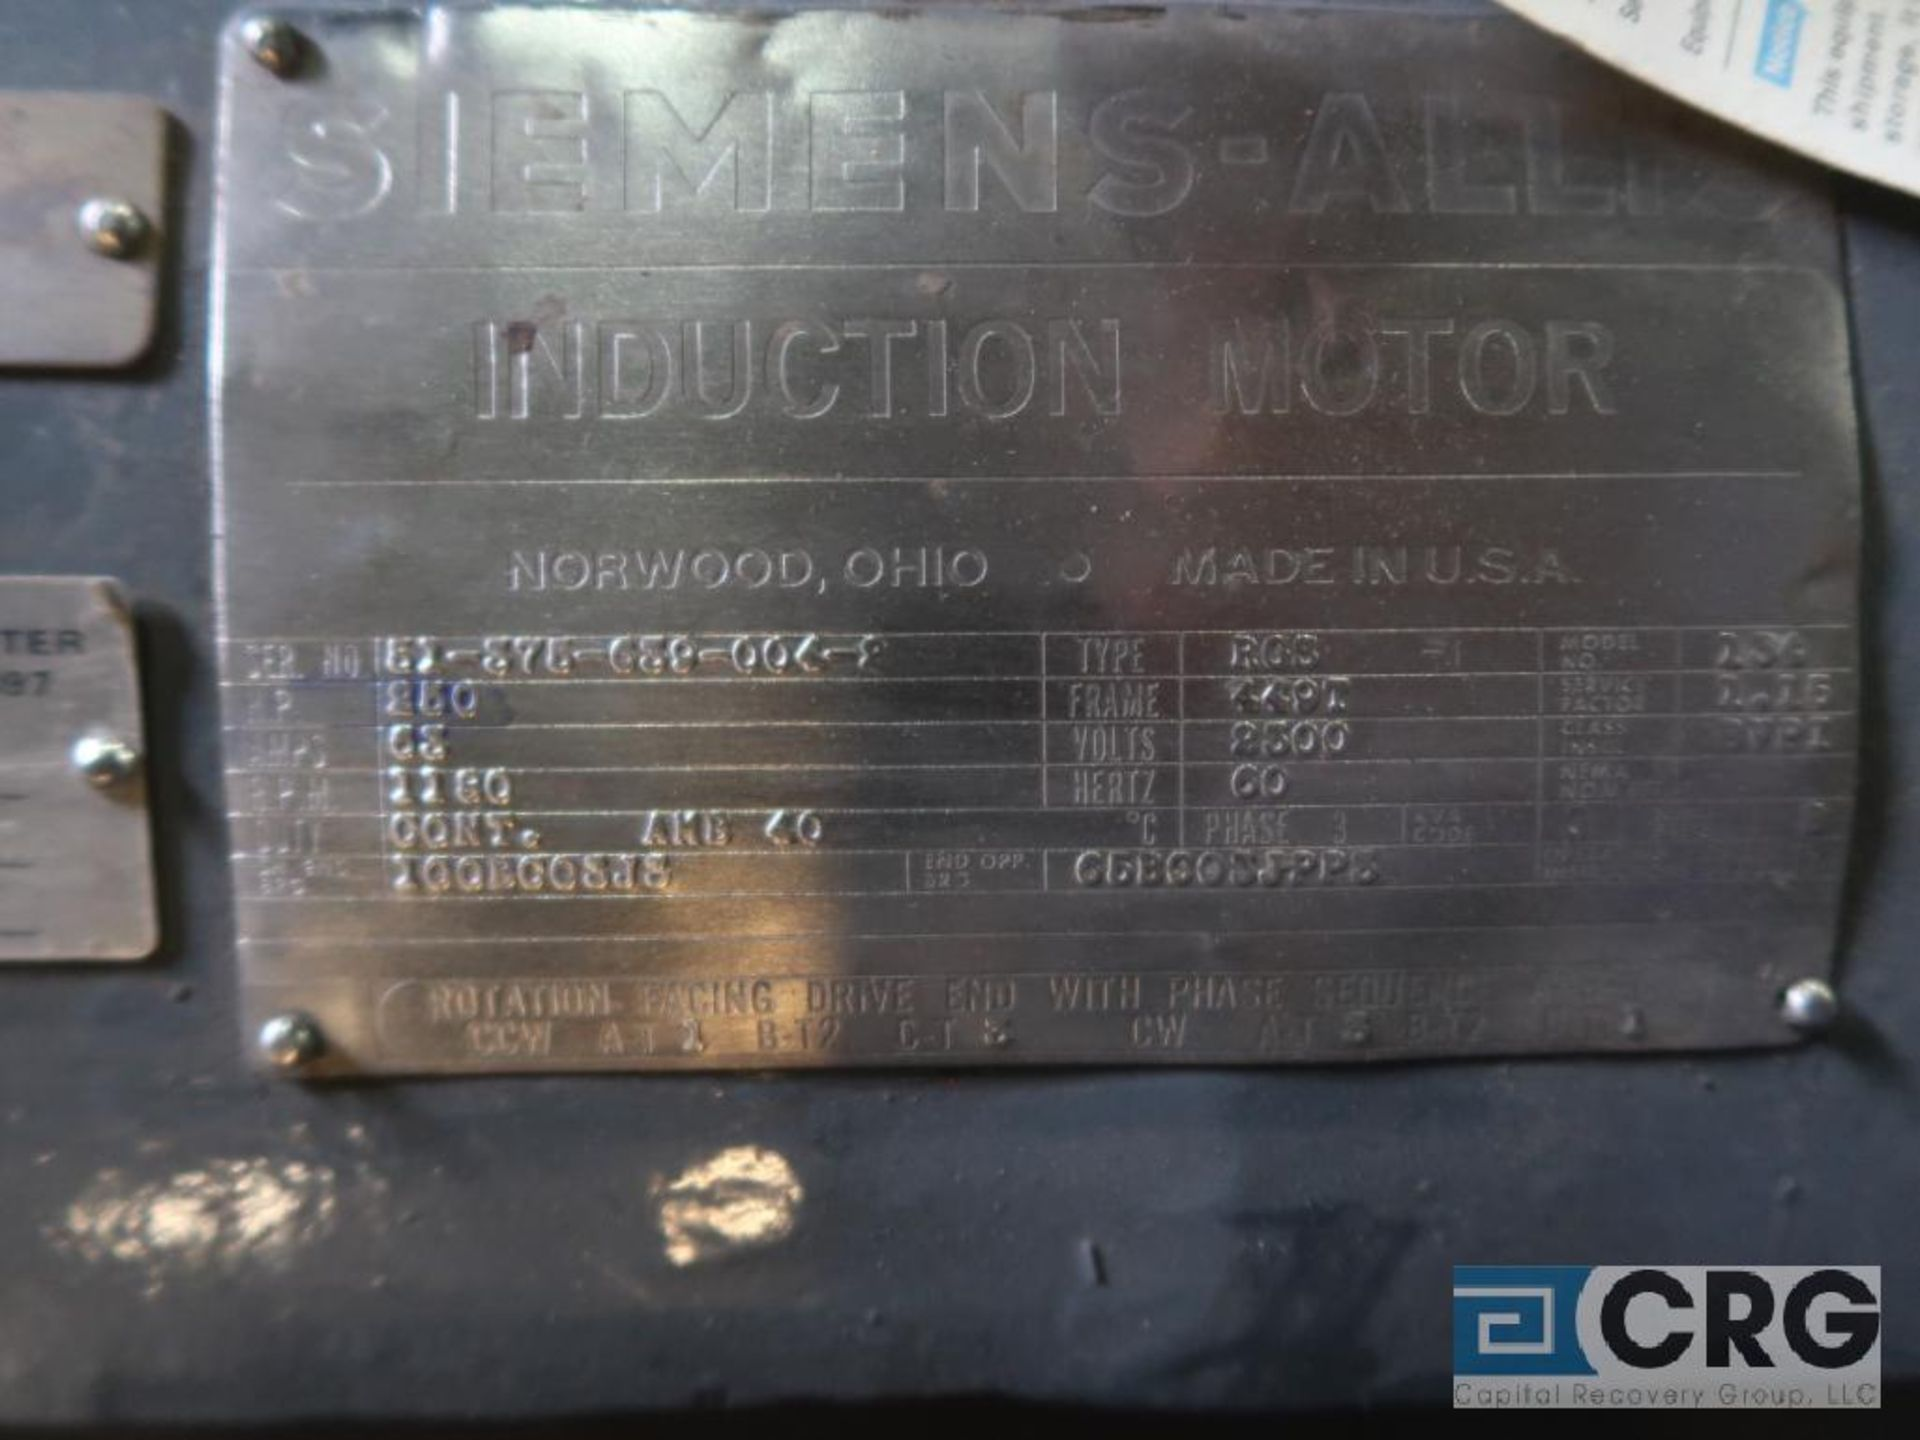 Siemens-Allis induction motor, 250 HP, 1,180 RPMs, 2,300 volt, 3 ph., 449T frame (Finish Building) - Image 2 of 2